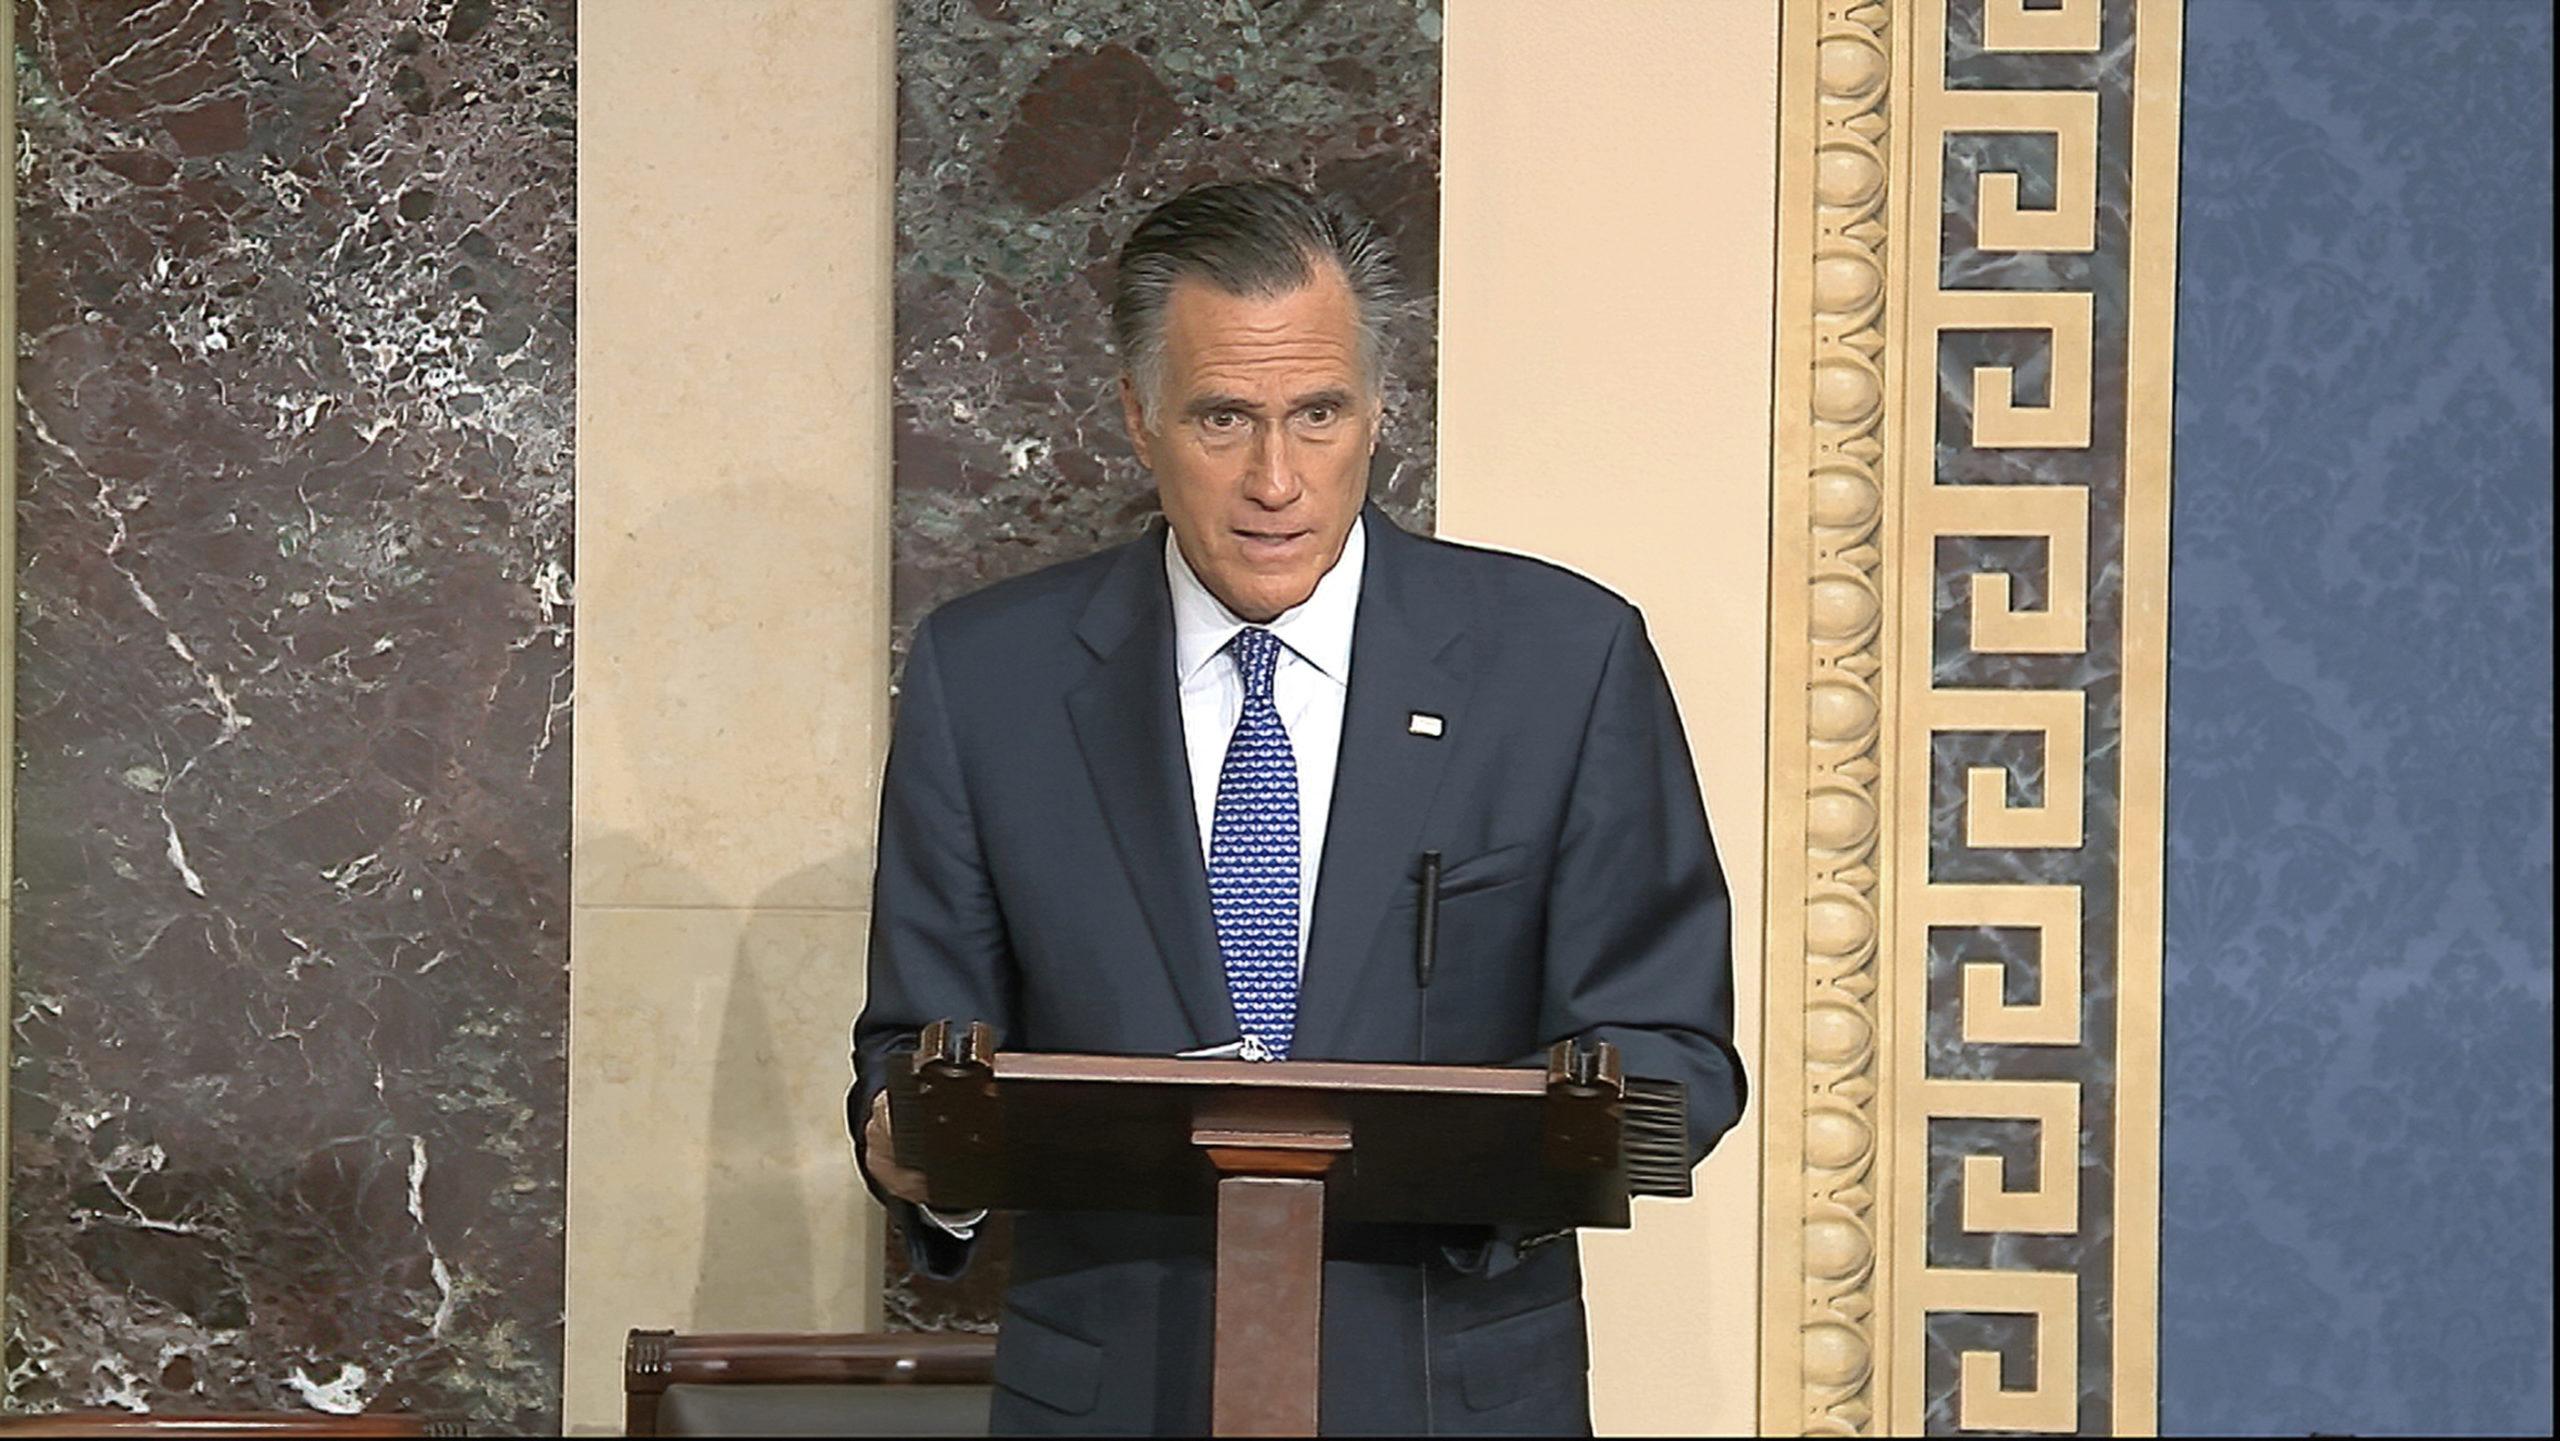 Sen. Romney Breaks With Gop, Will Vote To Convict Trump ...